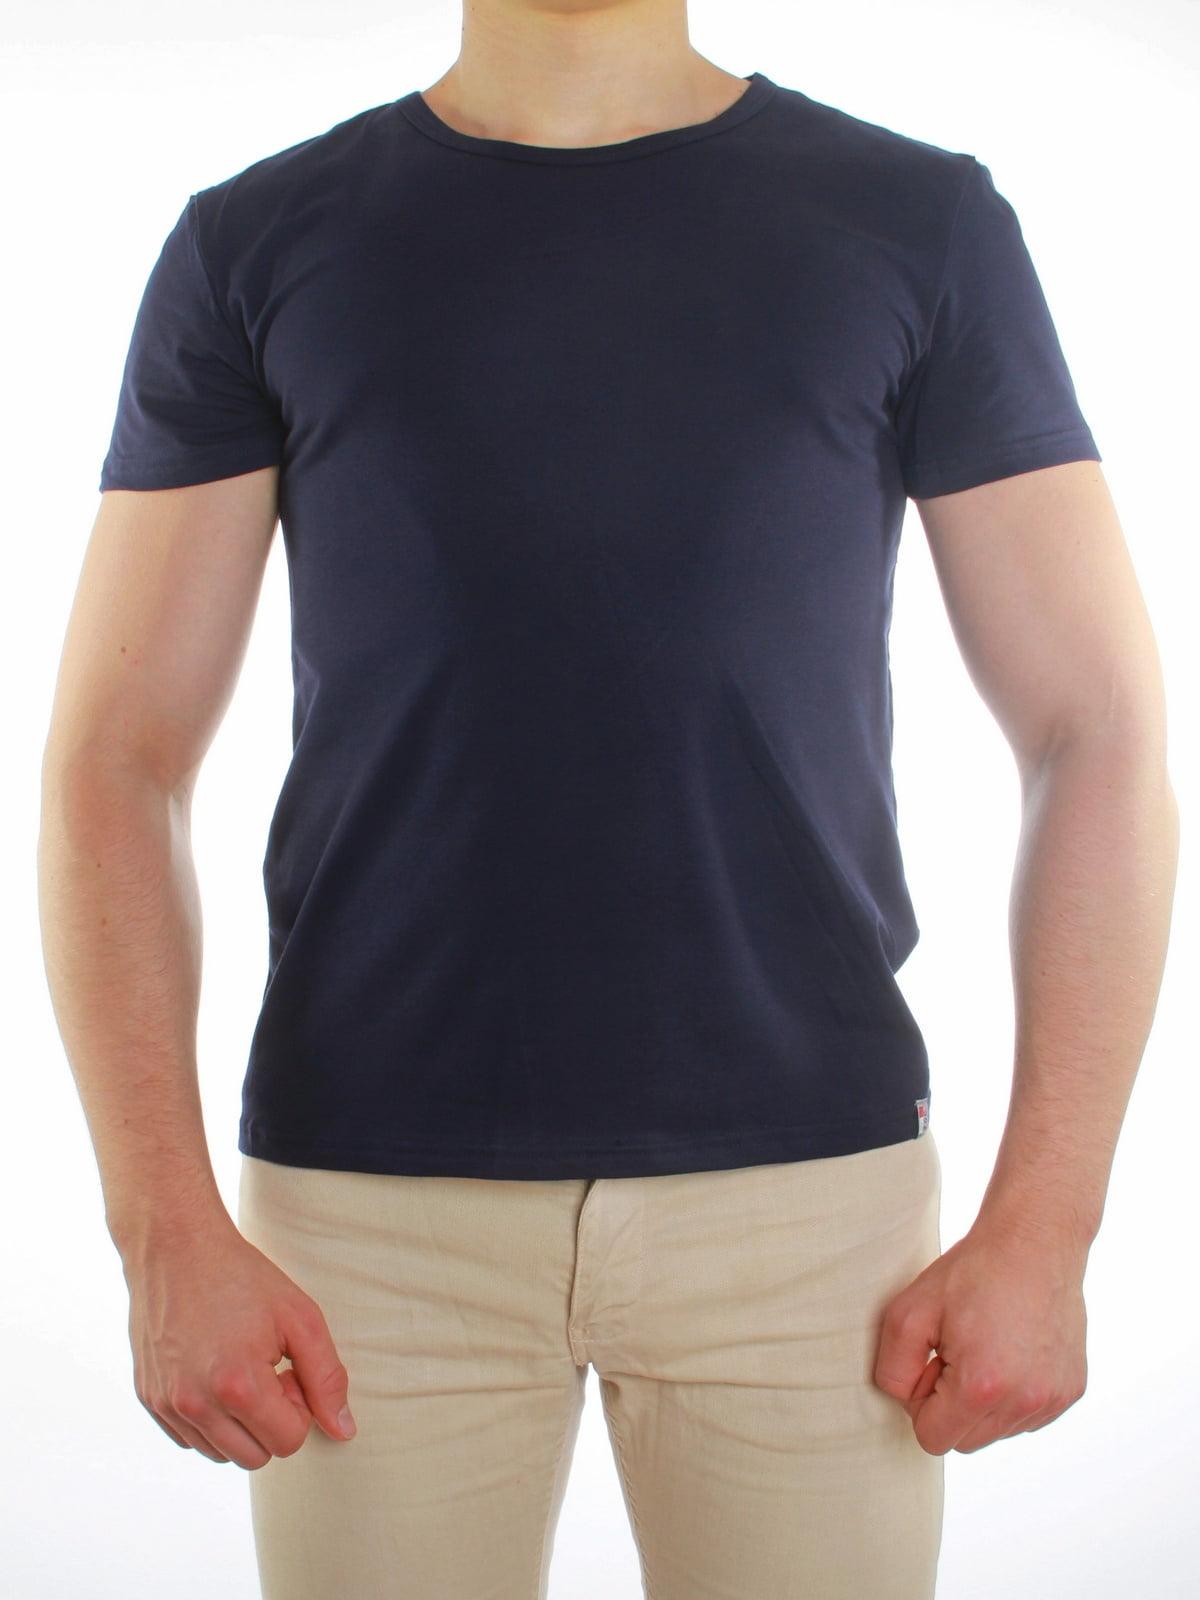 d332f5b6ea3d Однотонная синяя мужская футболка с круглым вырезом и короткими рукавами  Griff SIU01321 Blu Scuro